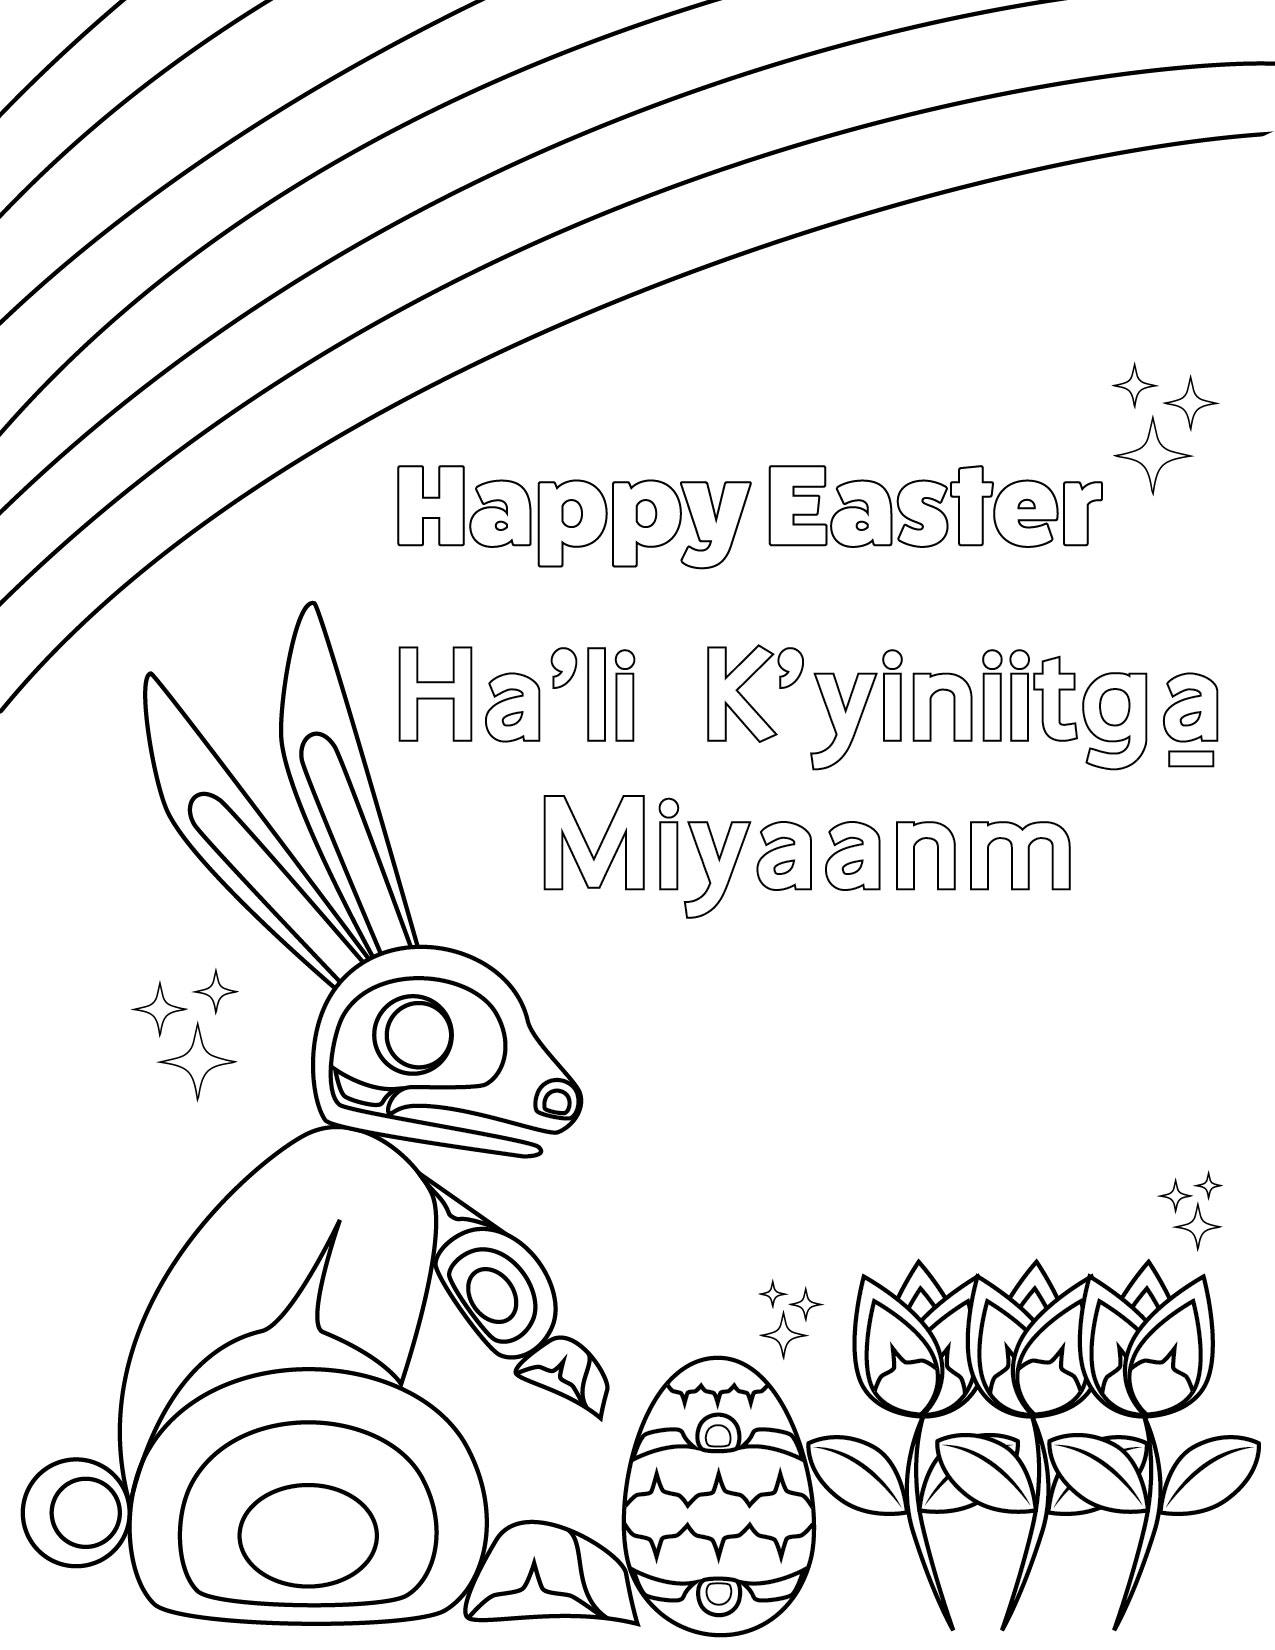 Kitsumkalum Easter Colouring Contest